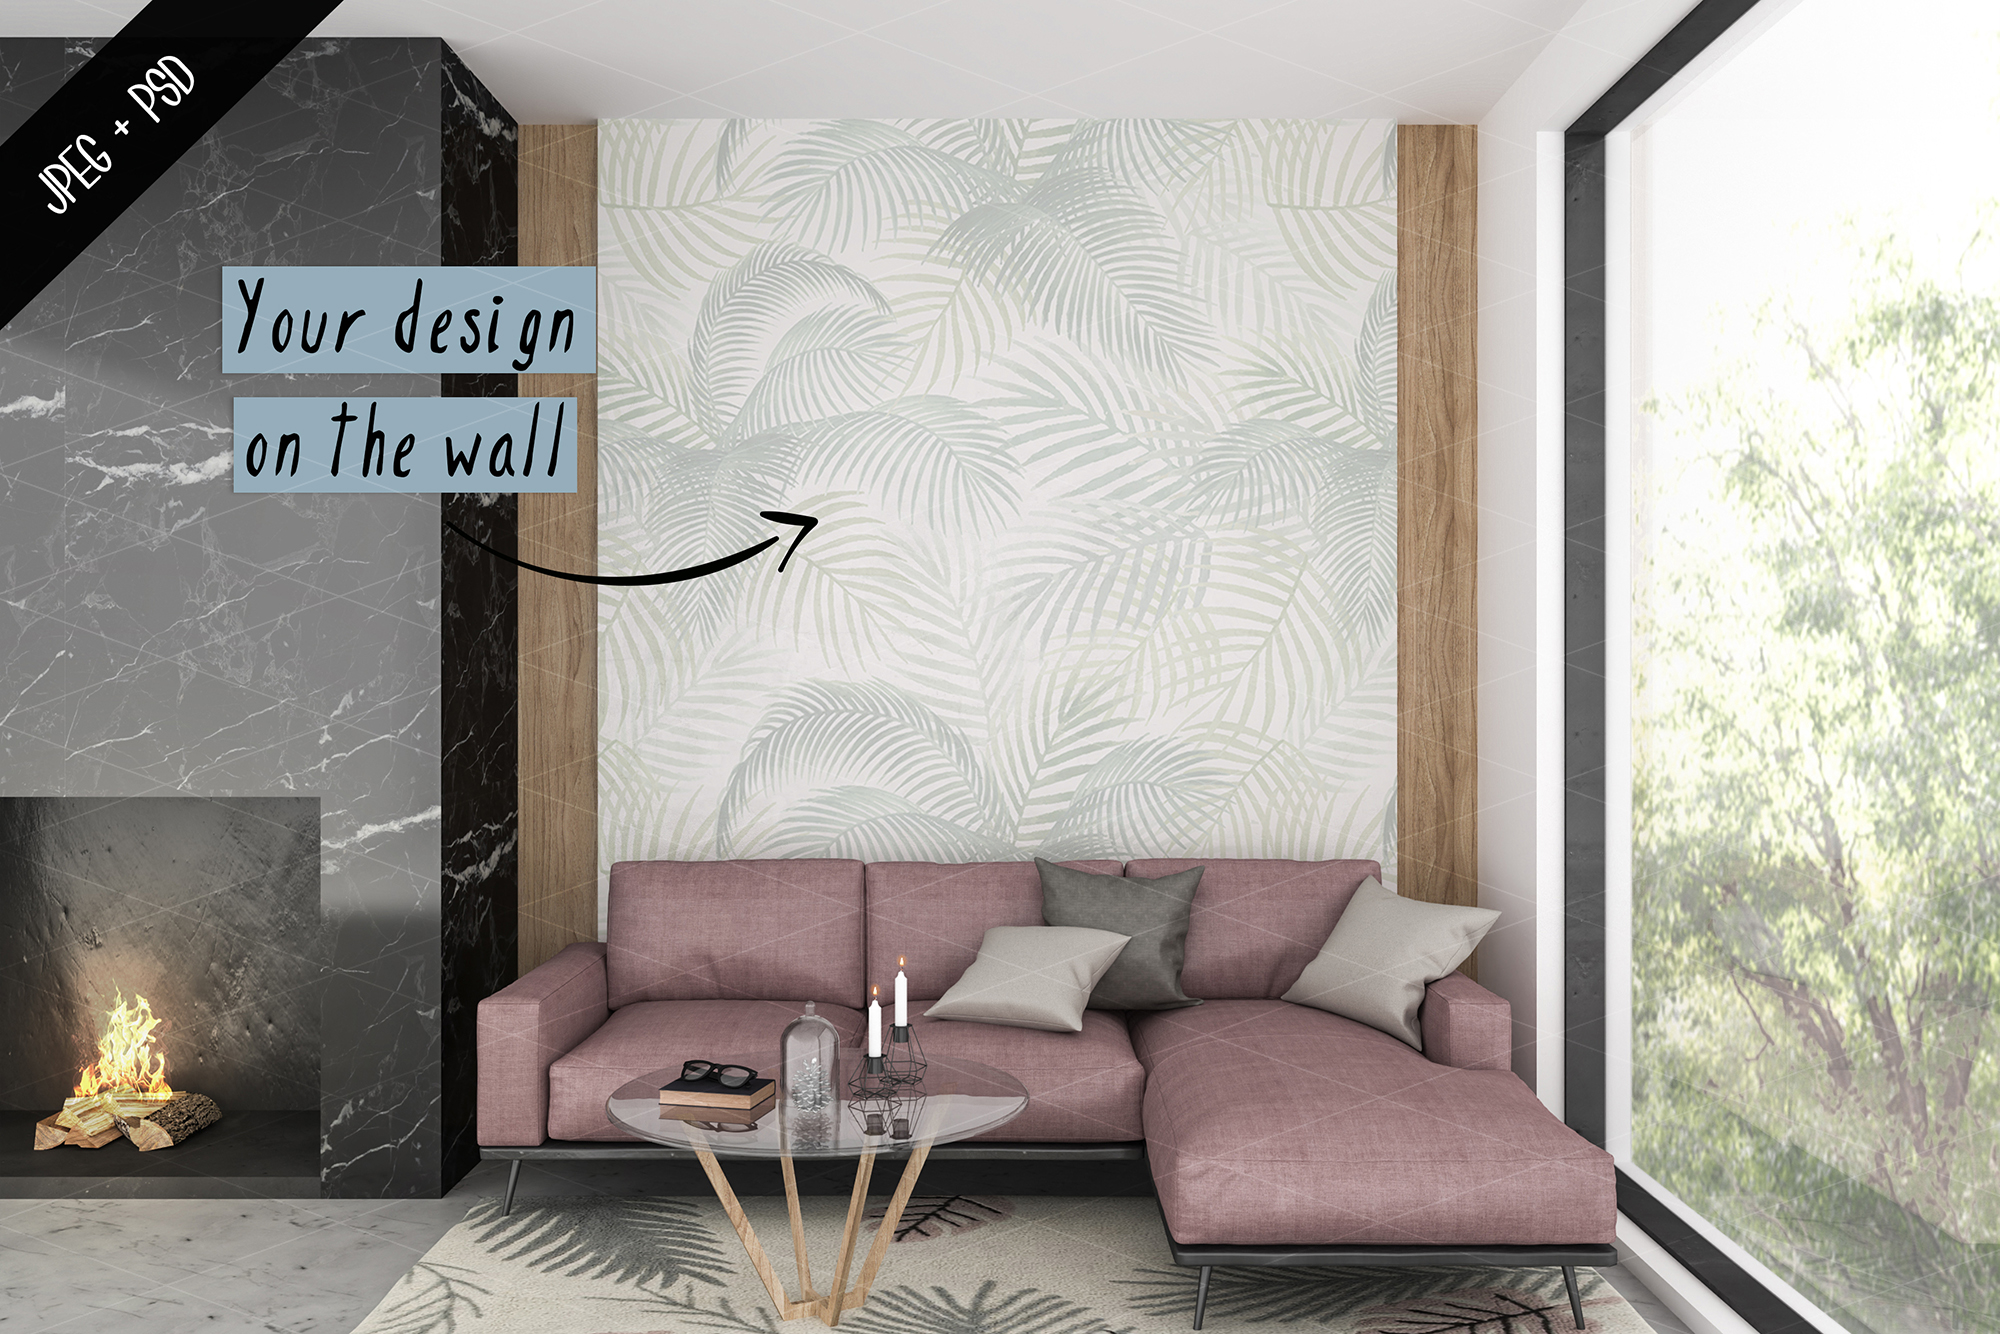 Frame mockup creator - All image size - Interior mockup example image 5